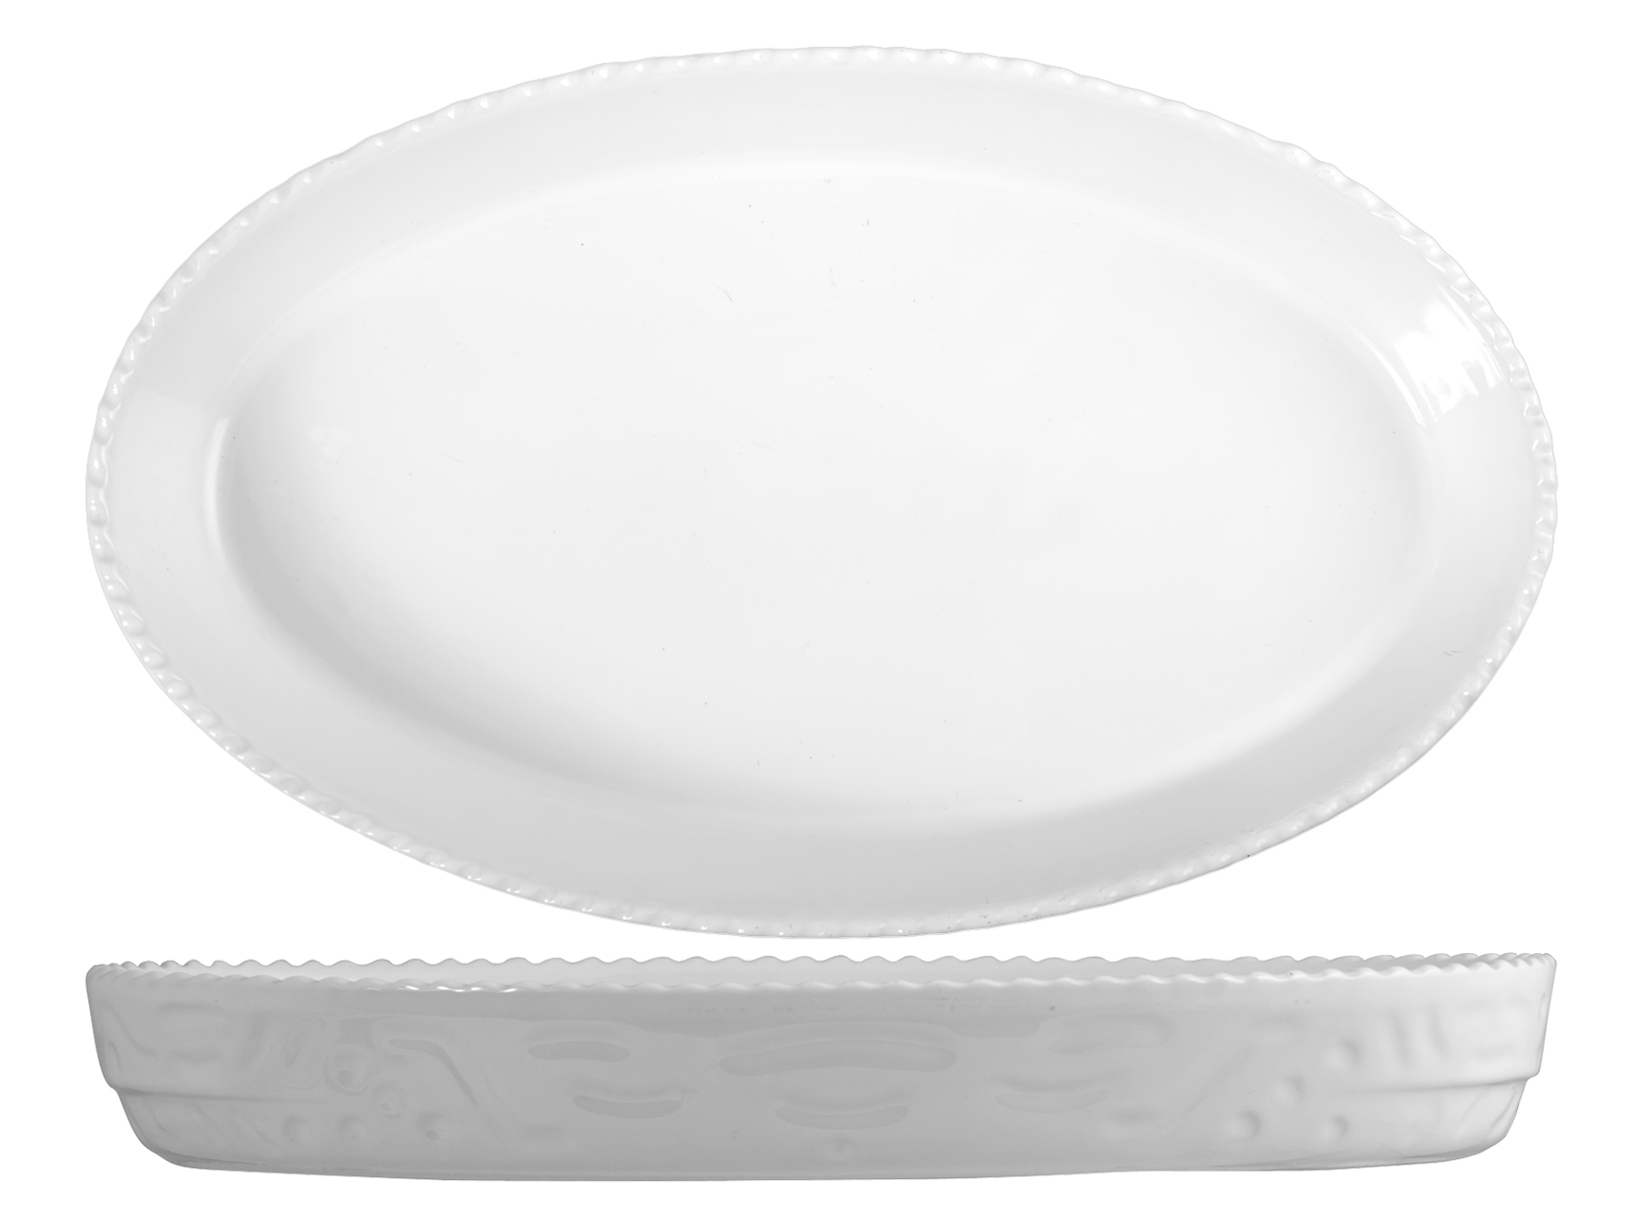 Buy Oval Porcelain Cm42 Dishware 17457661 | Italy2Us.com